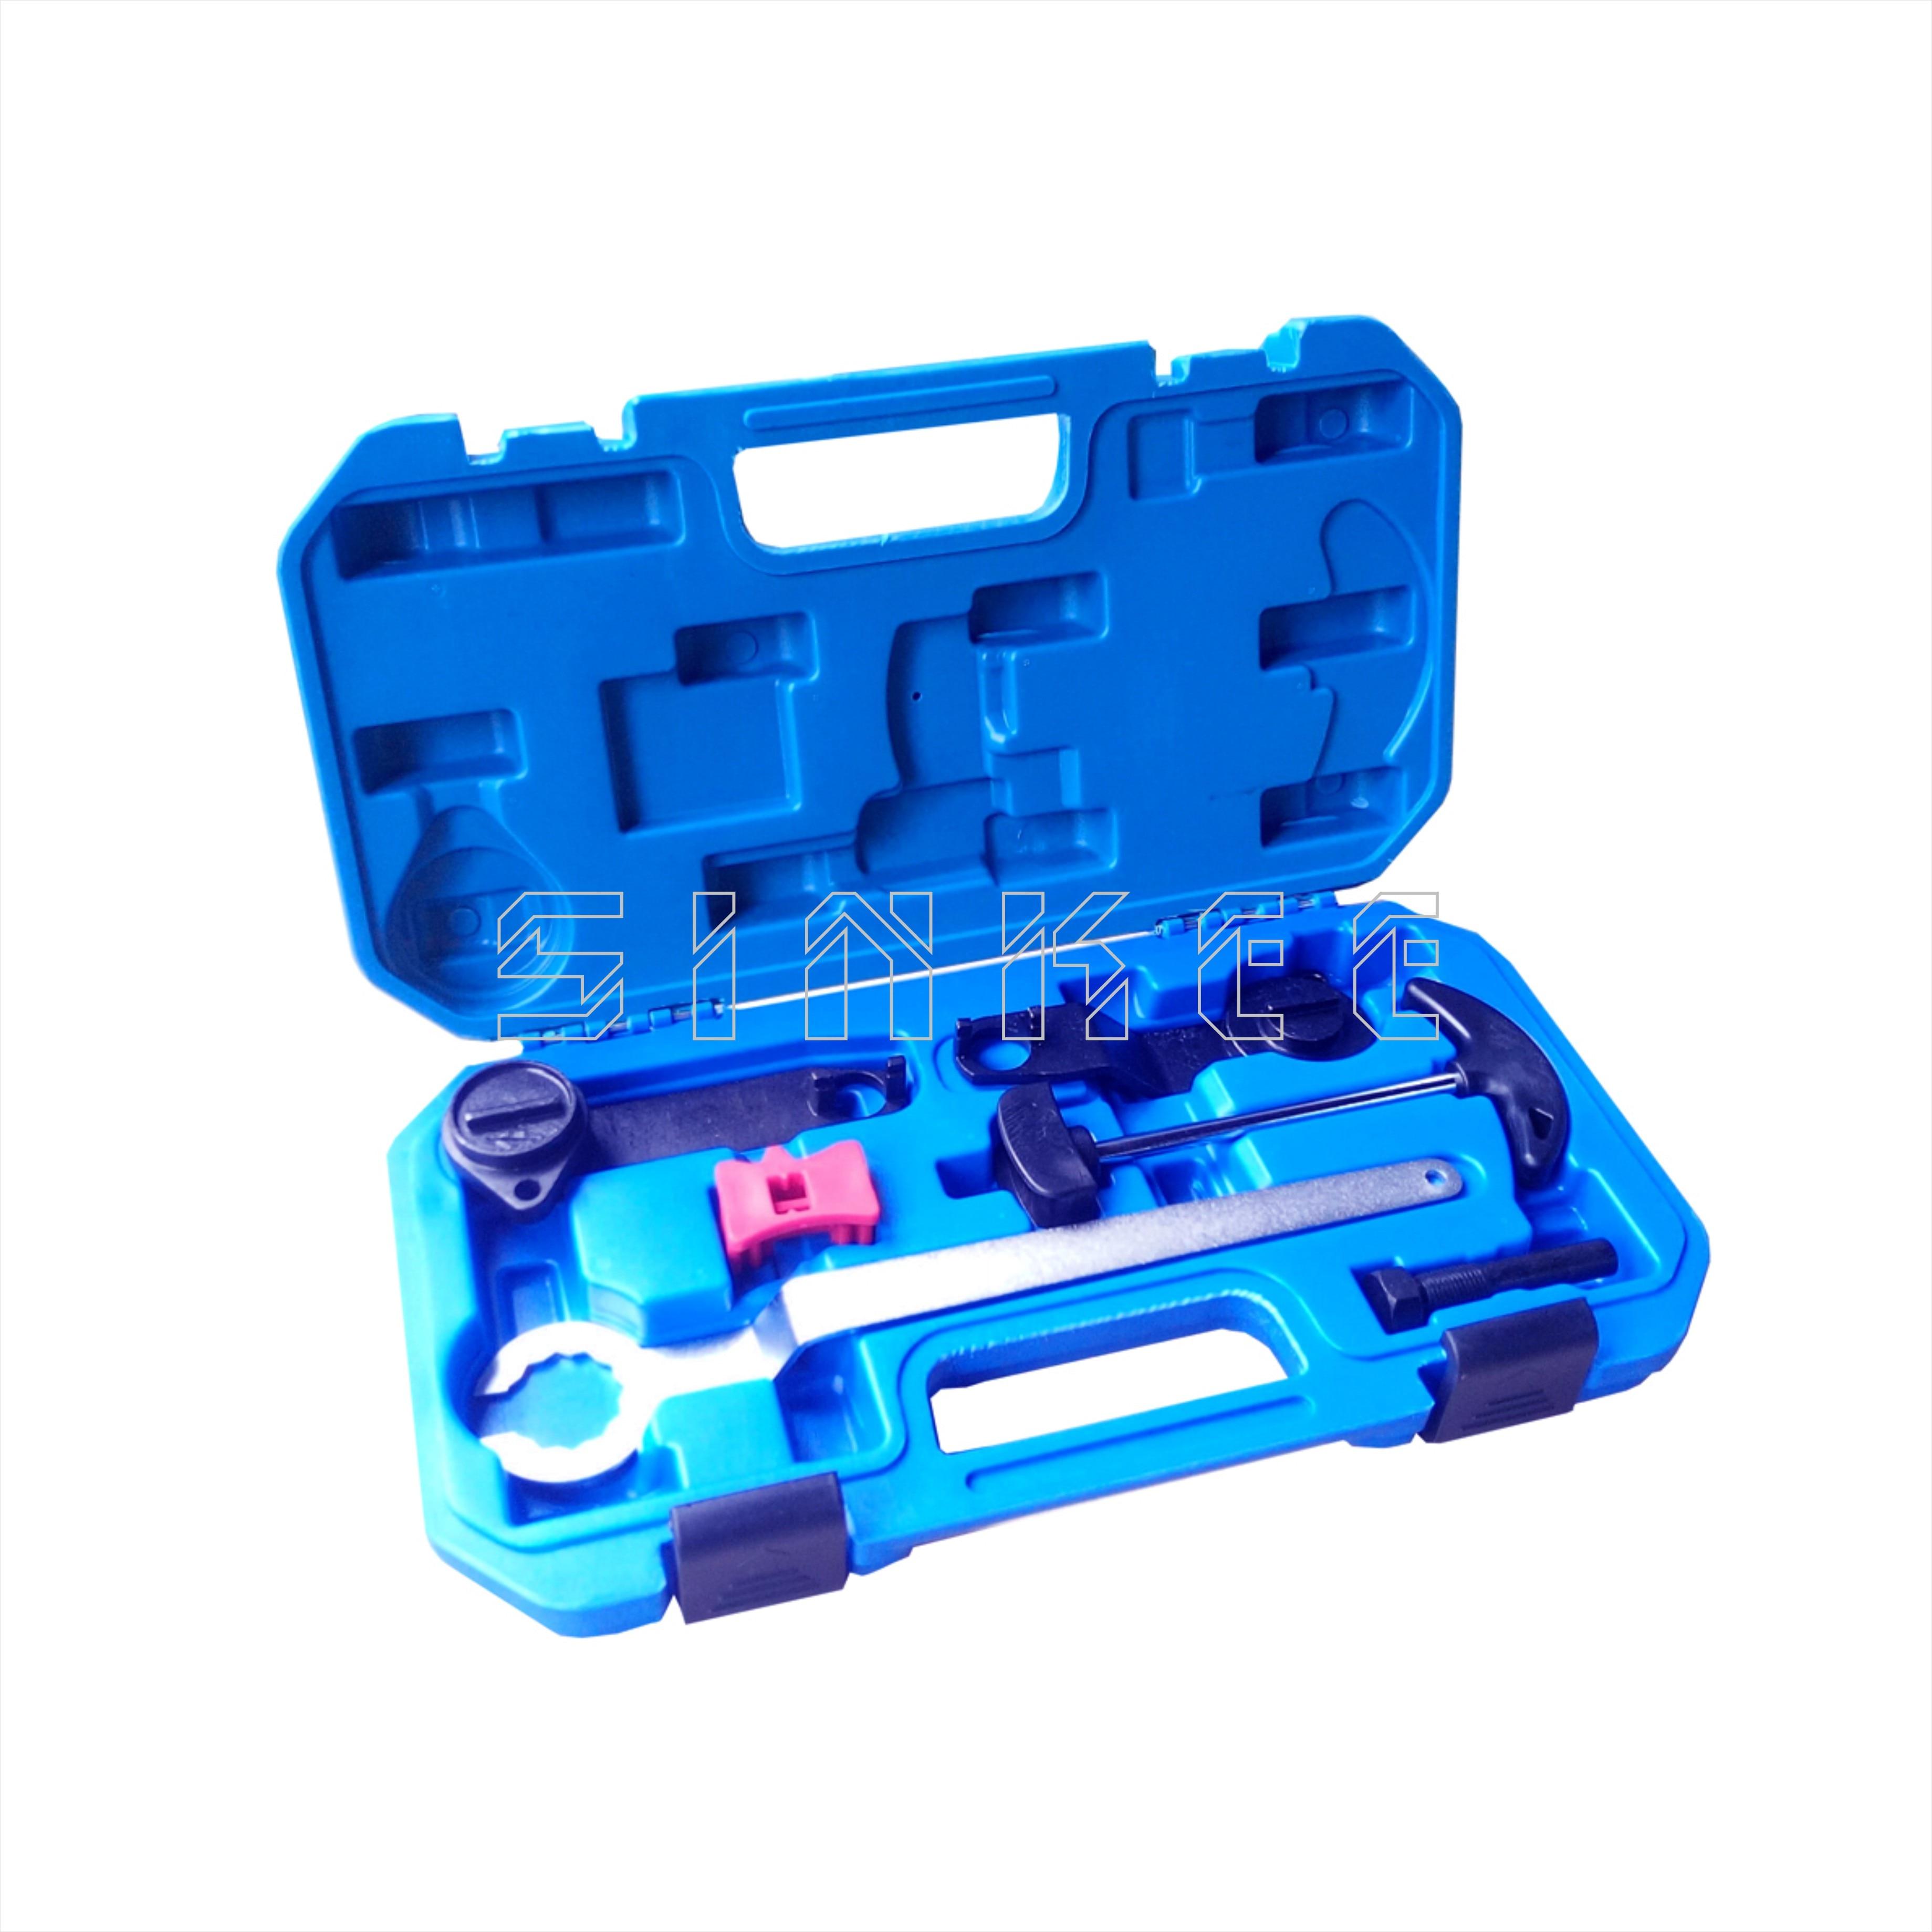 EngineTiming Tool Set For BMW B38 B48 B58 Camshaft Timing Unit Installer Remover